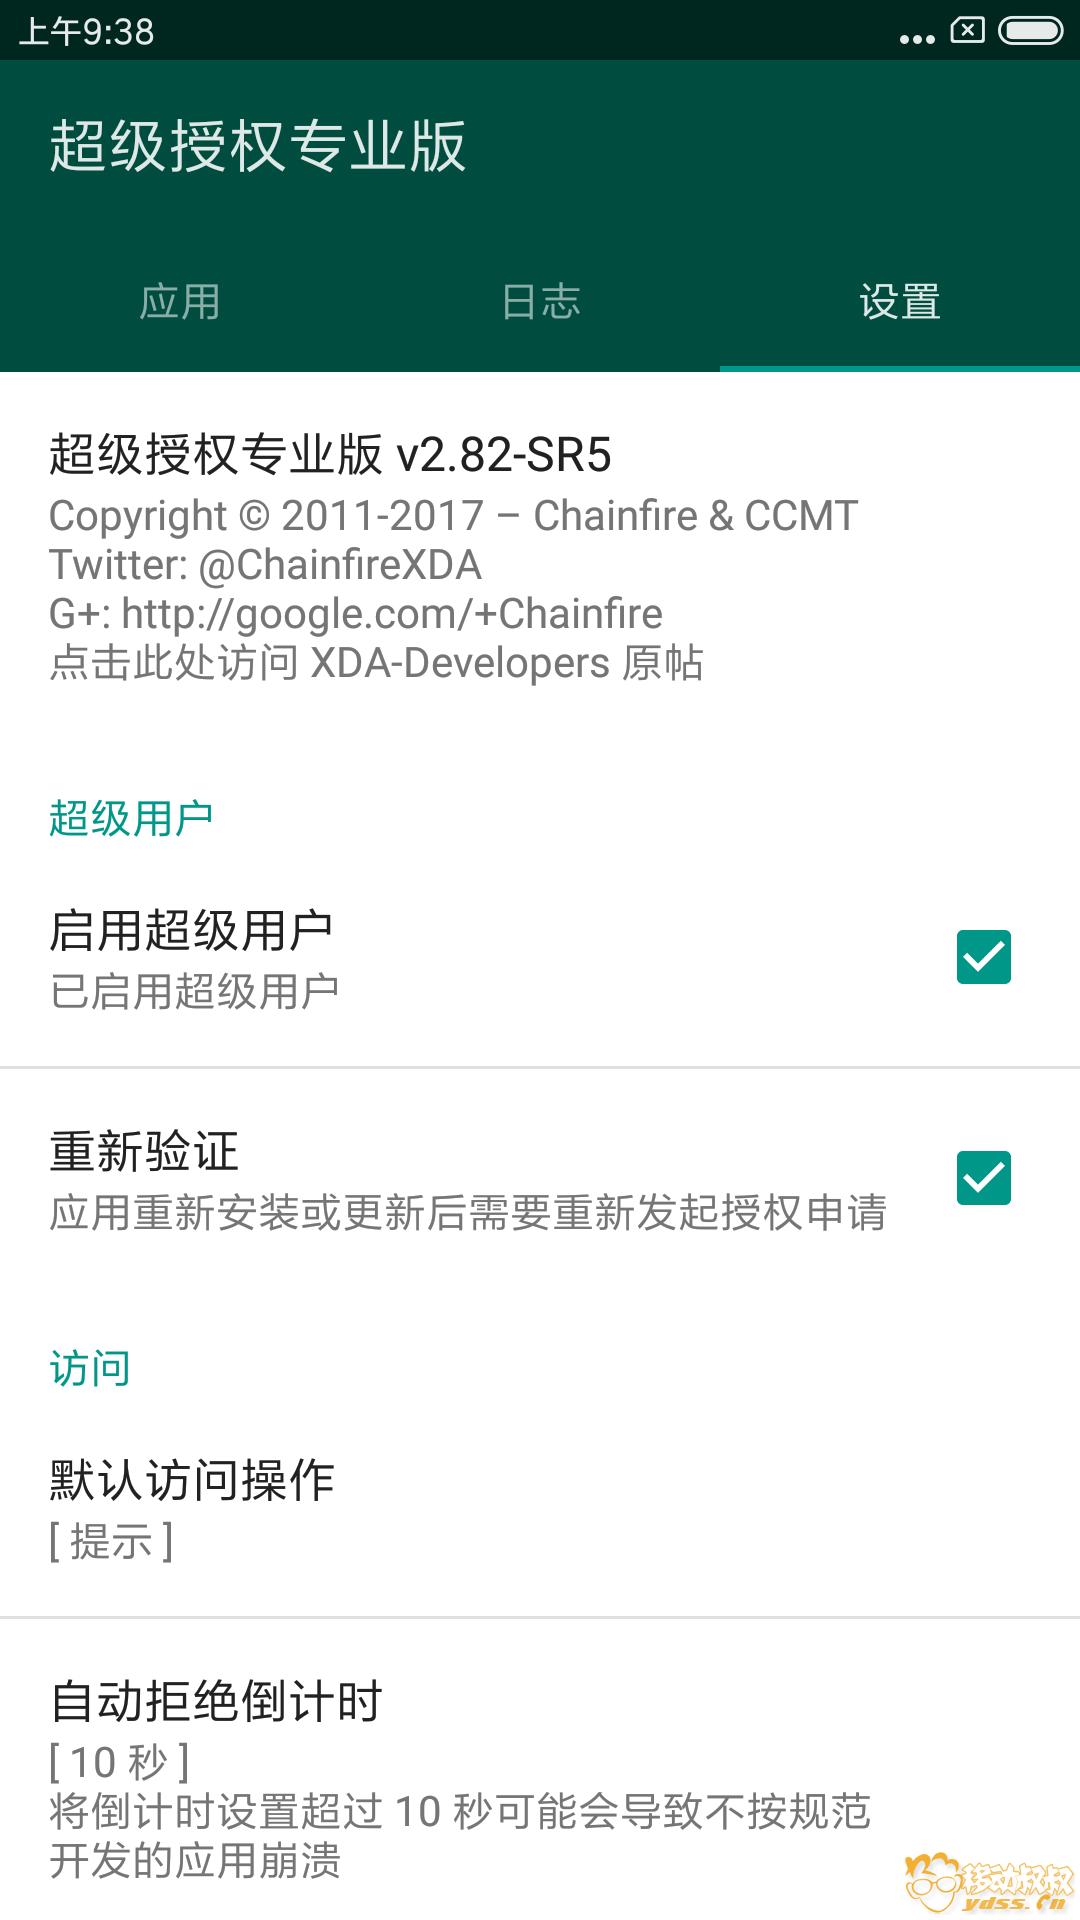 Screenshot_2018-08-15-09-38-34-451_eu.chainfire.supersu.png